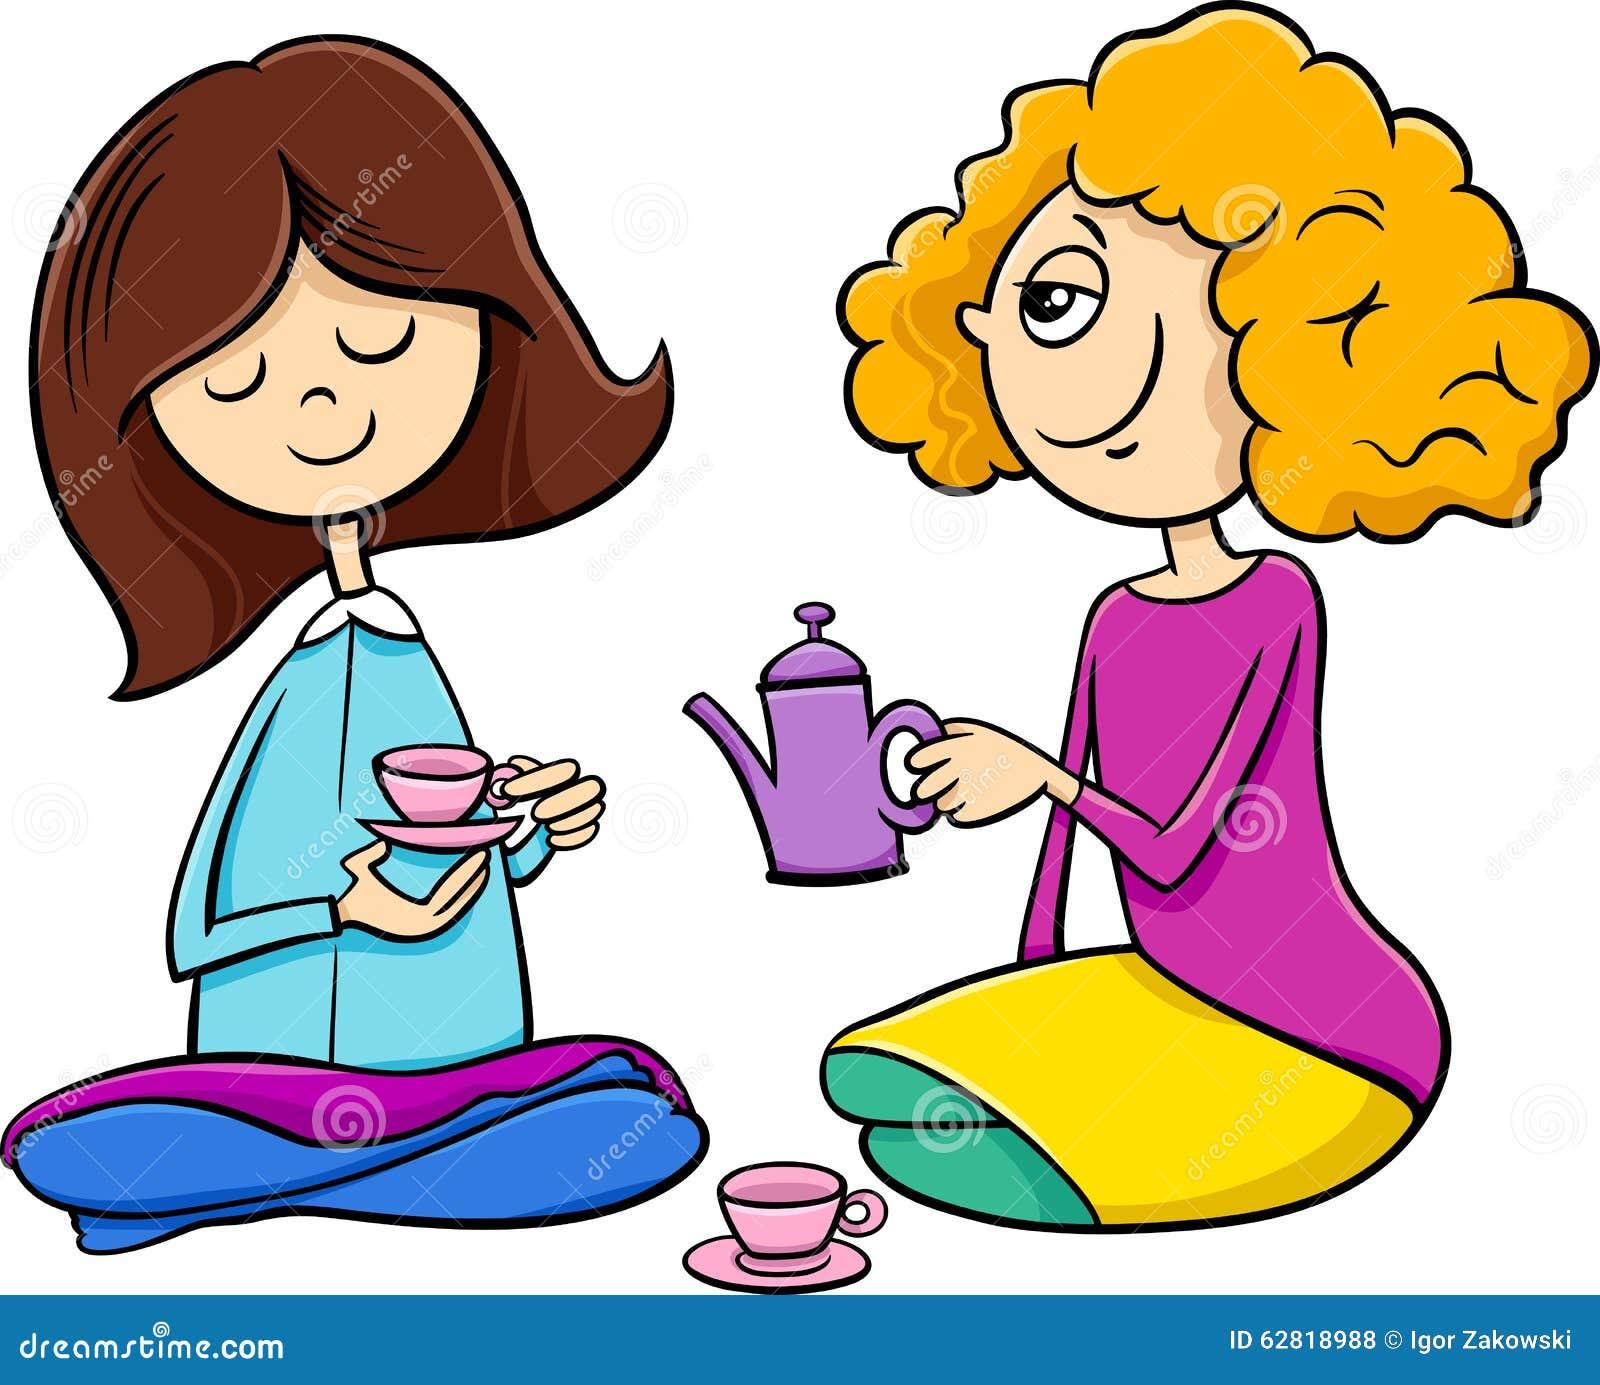 Girls Playing House Cartoon Stock Vector Image 62818988